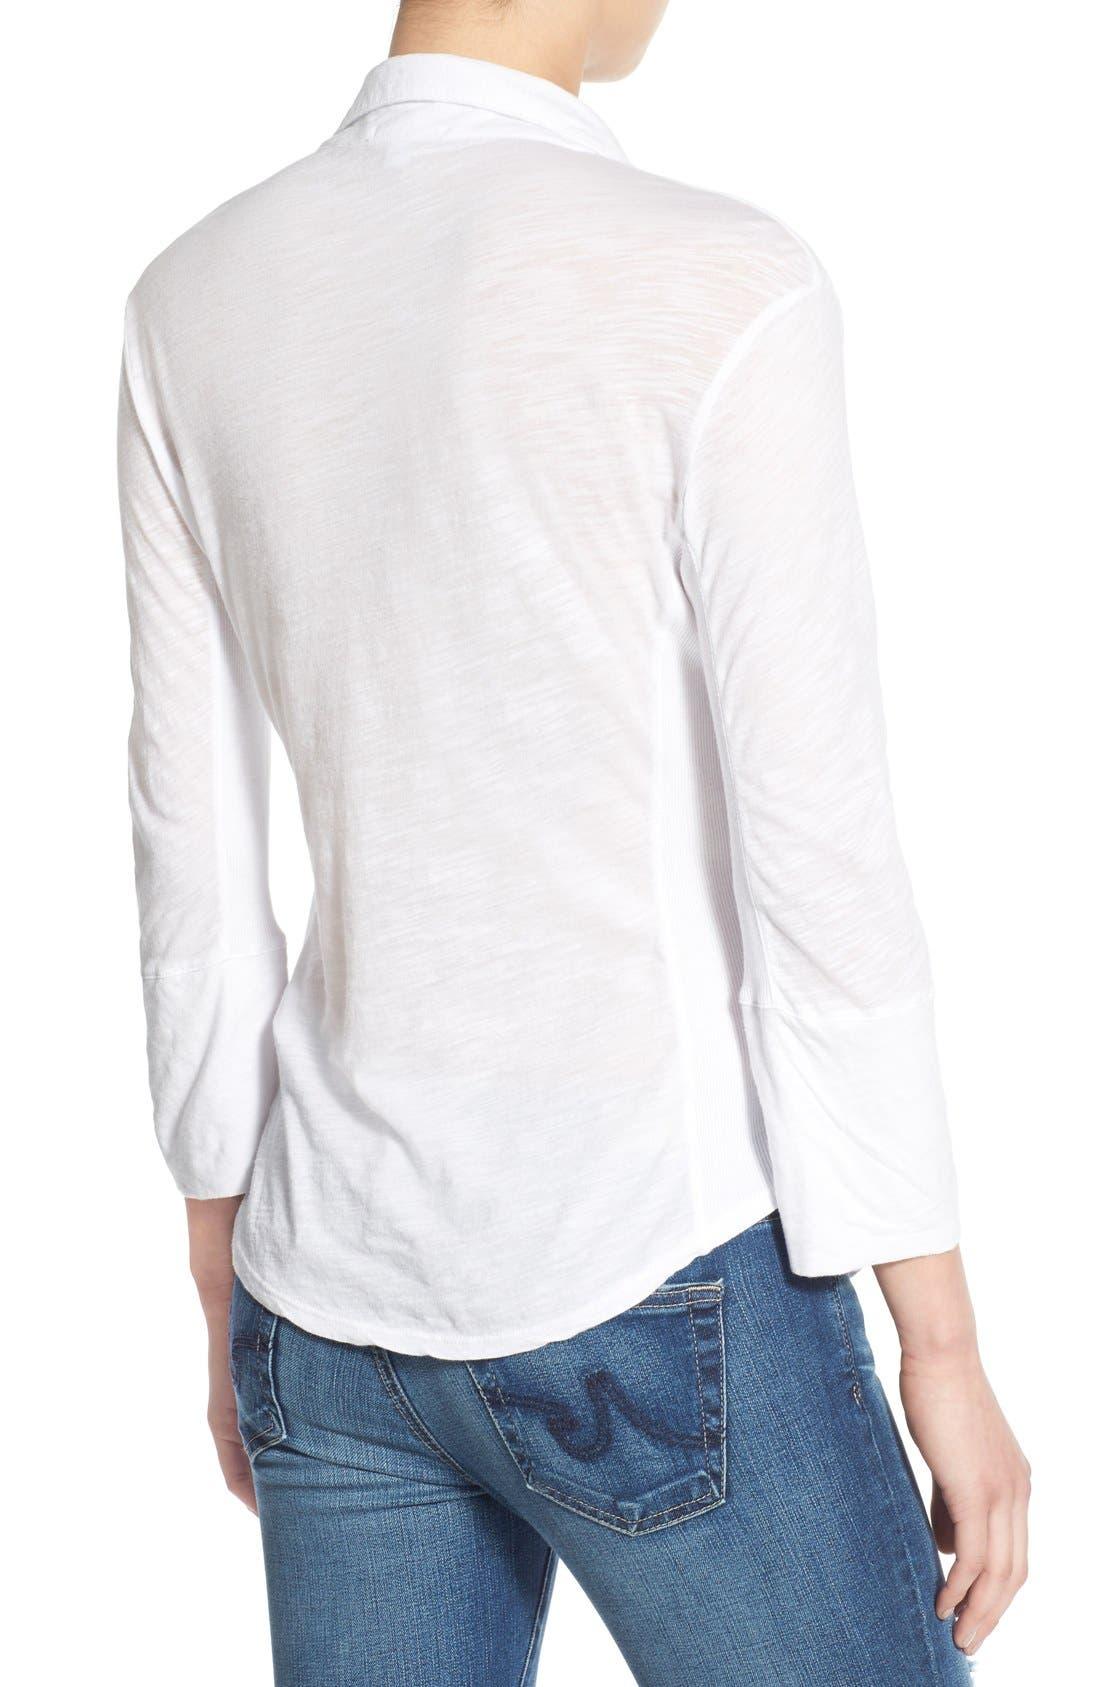 Alternate Image 2  - James Perse Sheer Slub Panel Shirt